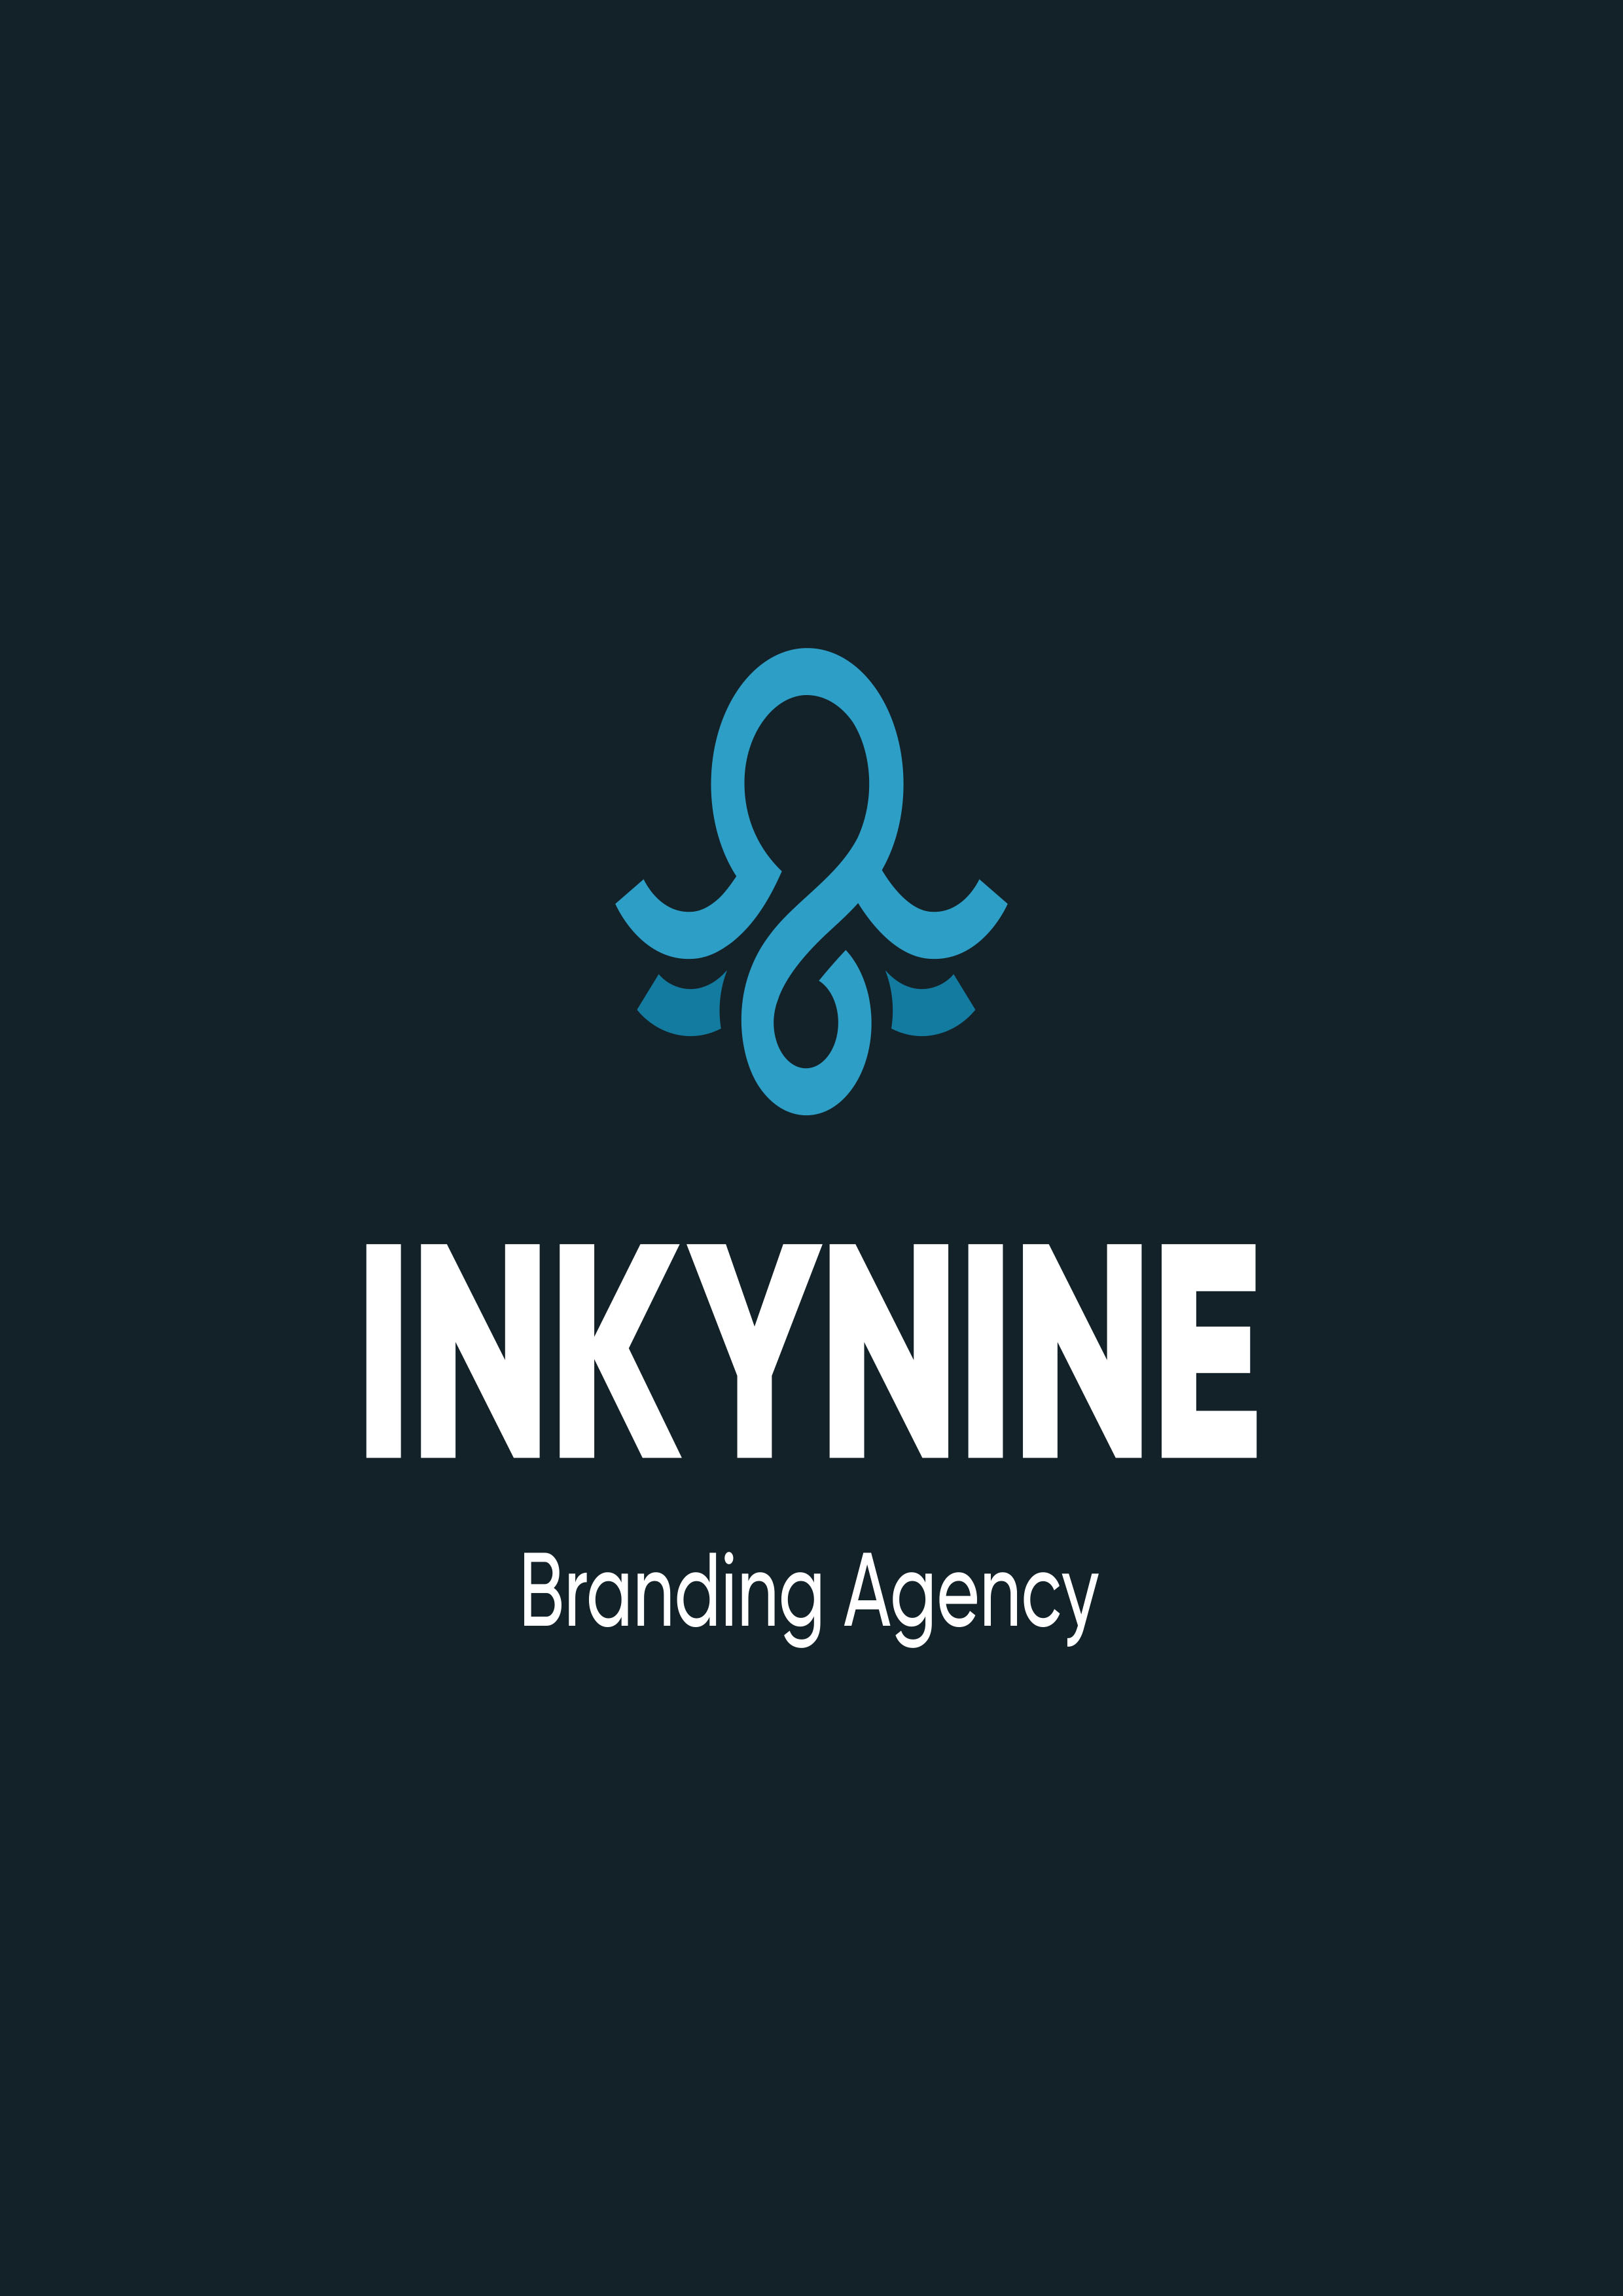 Inky9.jpg